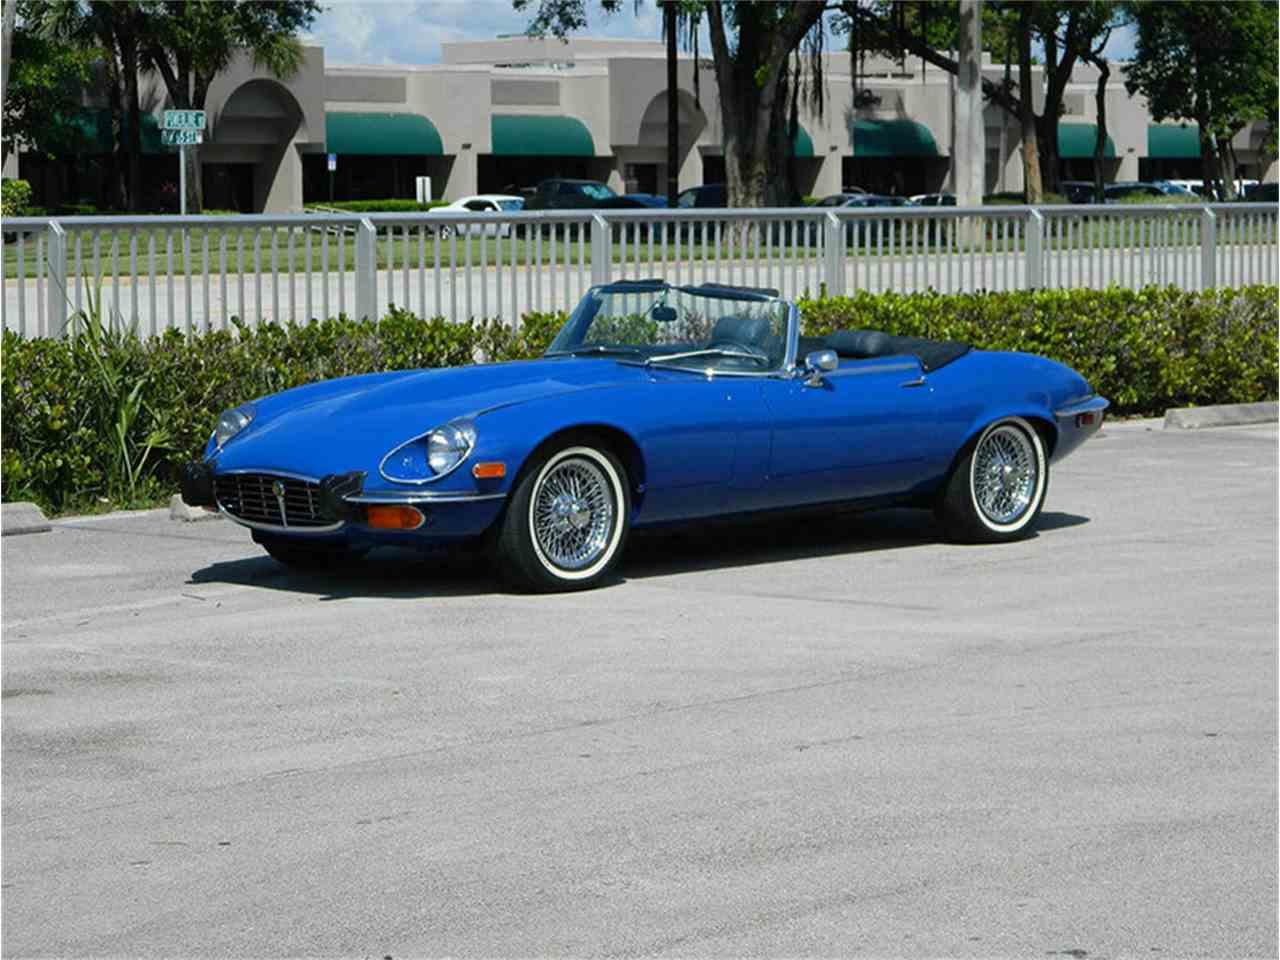 sedan photo fl fort stock in sale jaguar for lauderdale vehicle details myers ft